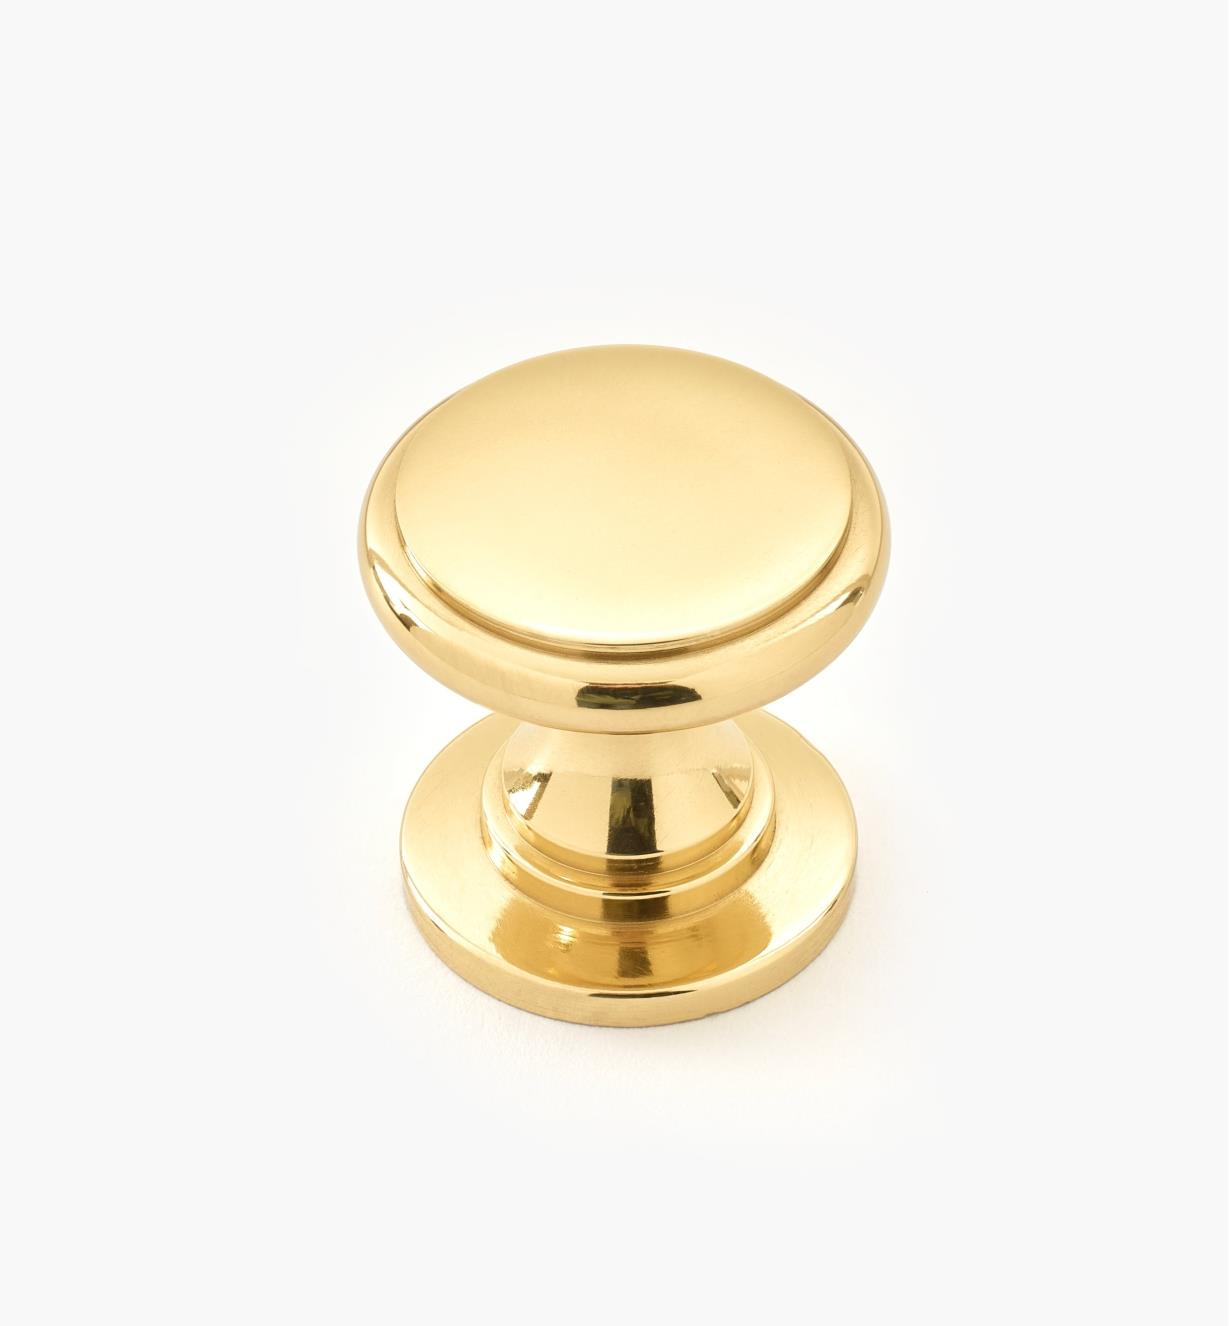 00W3420 - Petit bouton en laiton II, 3/4 po x 3/4 po